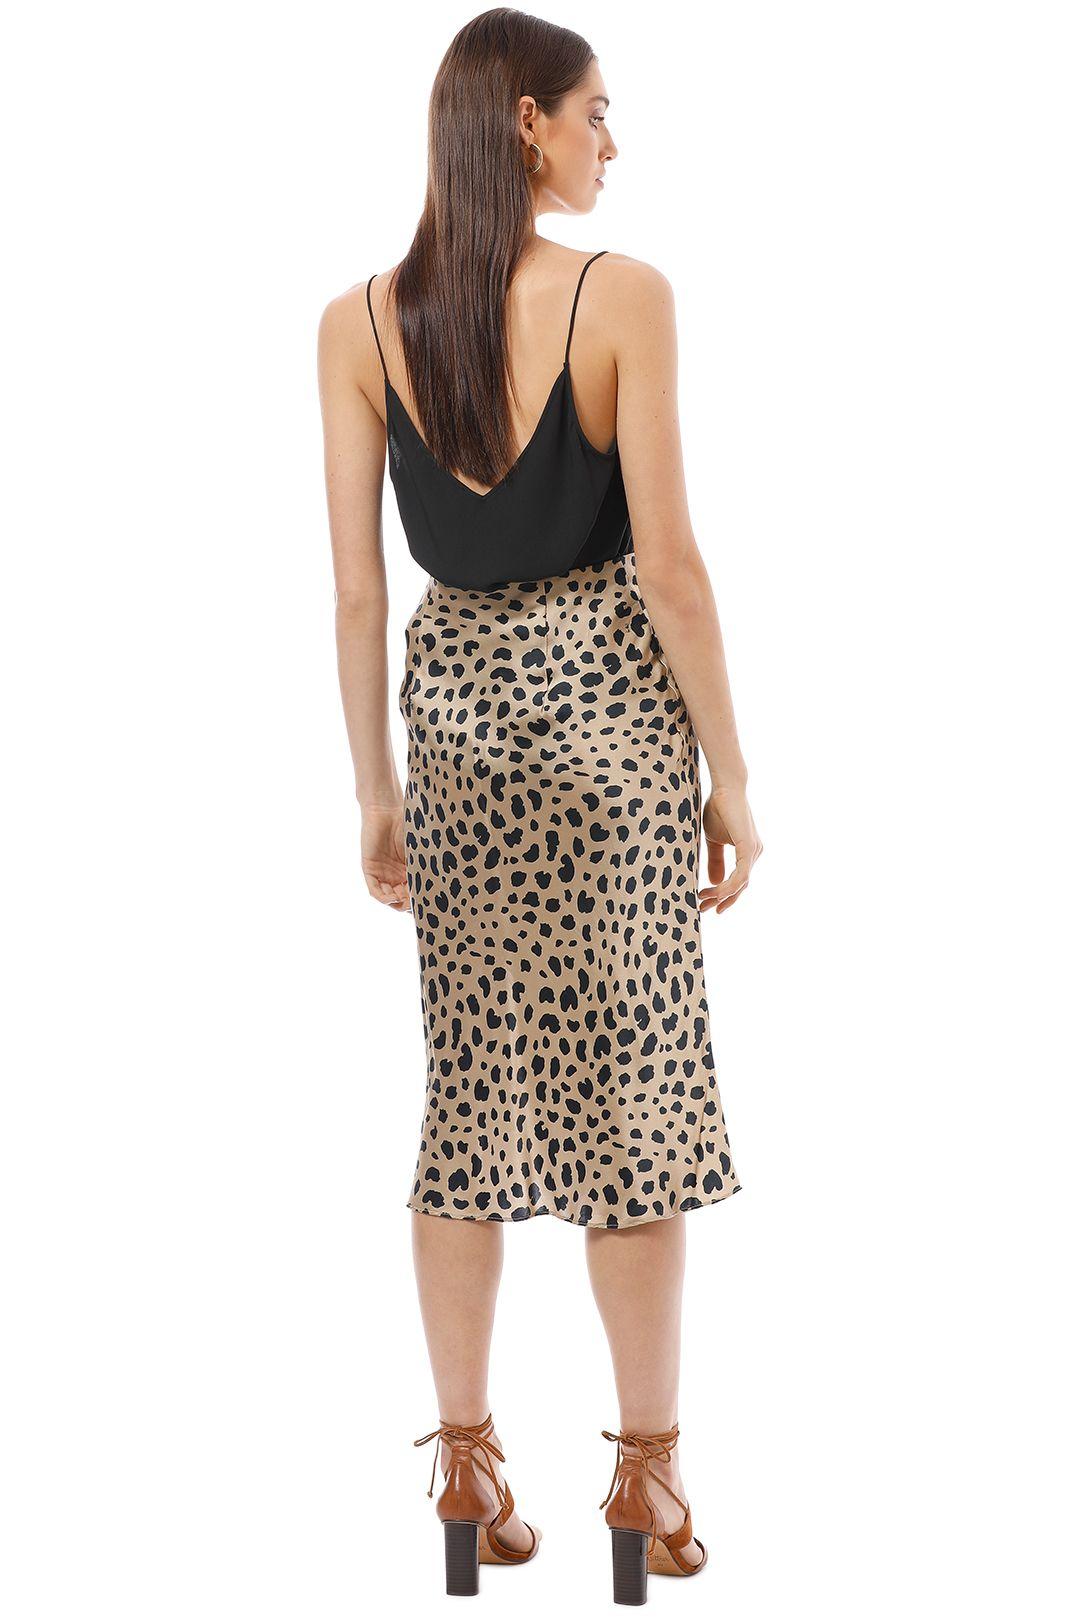 Realisation Par - Naomi Wild Things - Leopard - Back